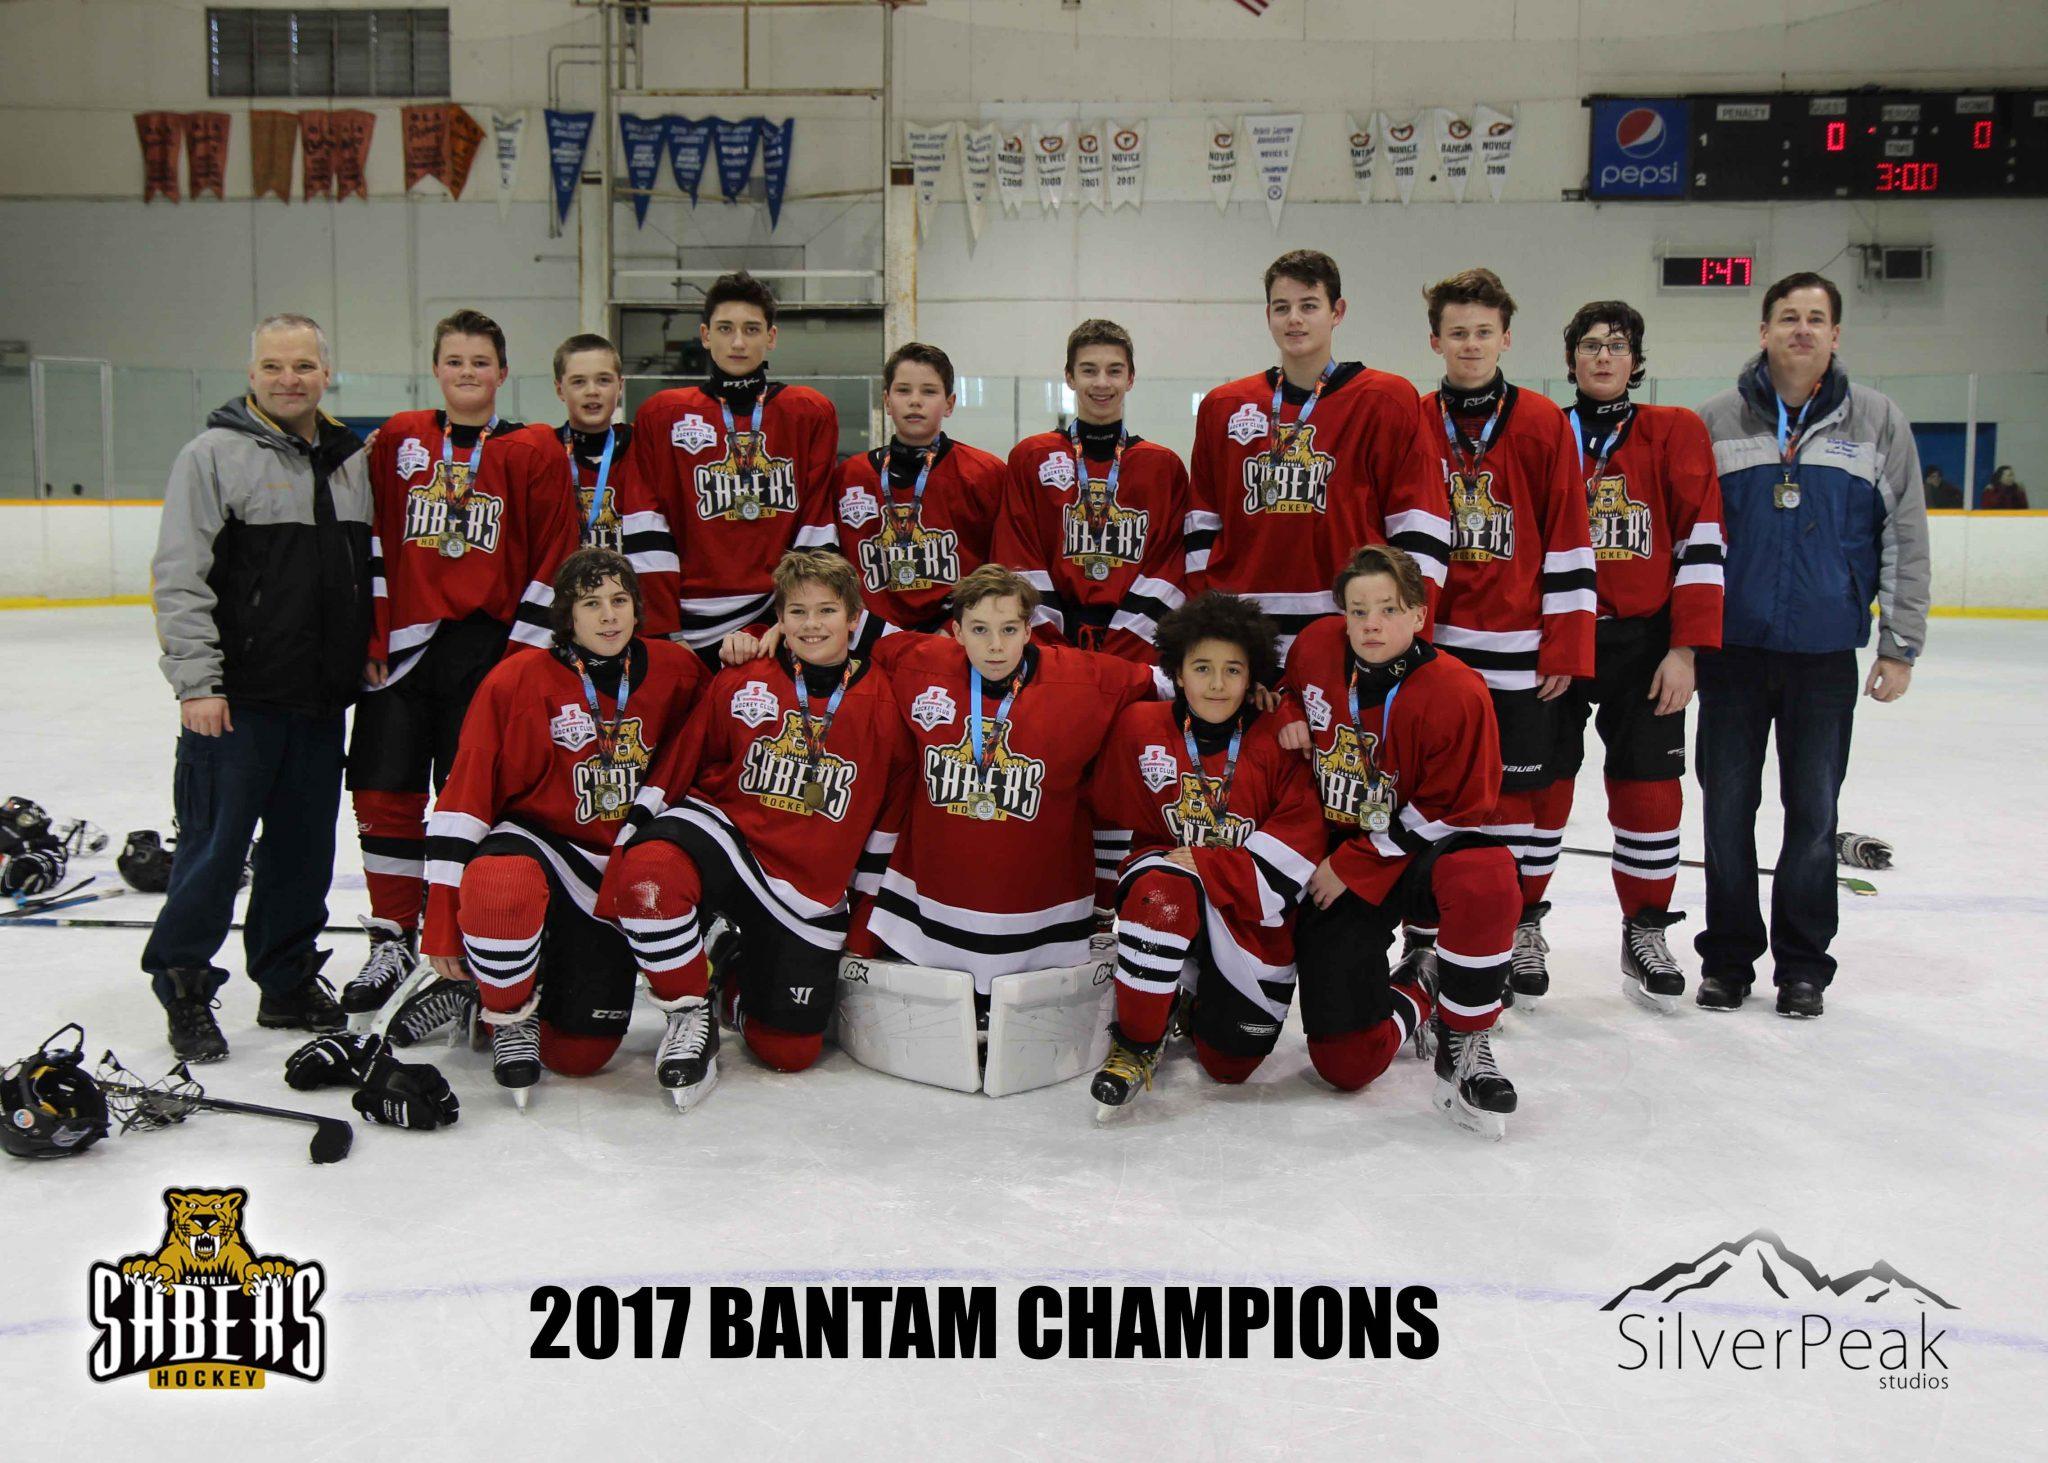 _Bantam Team Red Champions